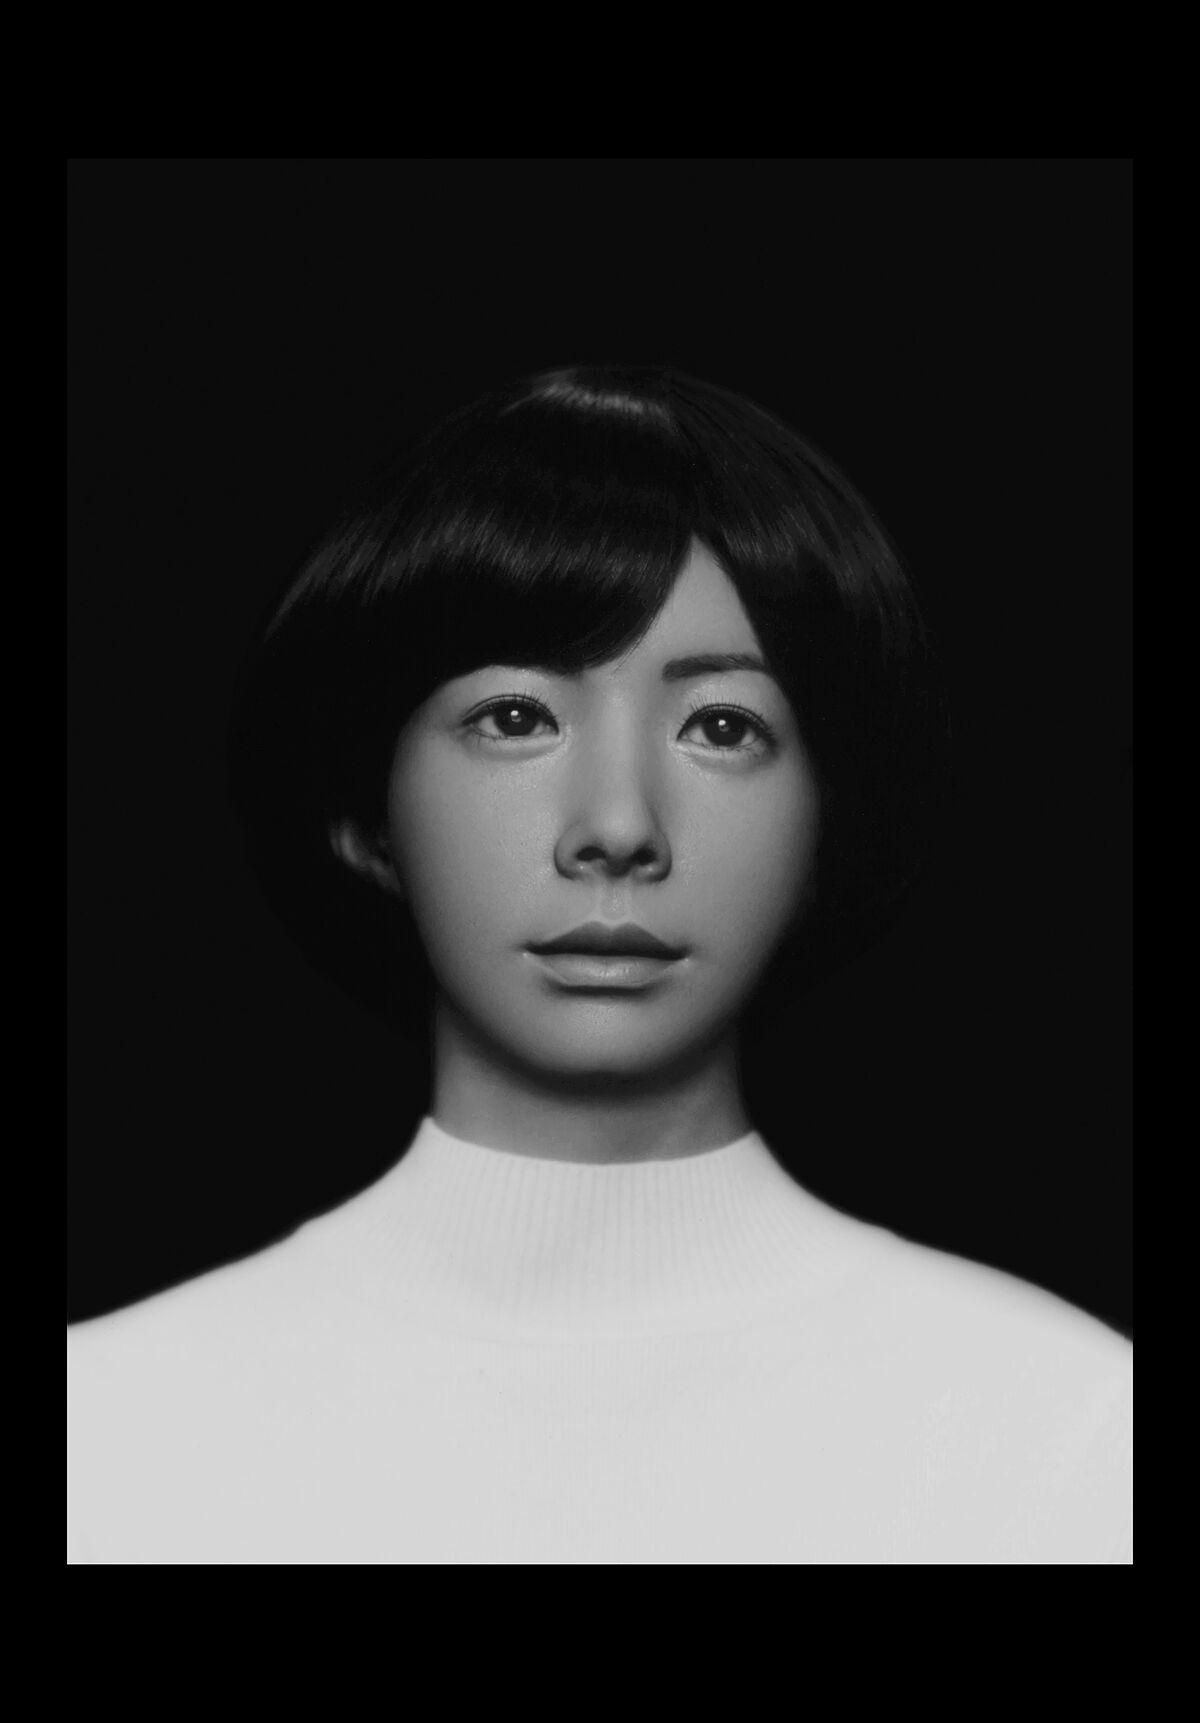 Photo by Wanda Tuerlinckx/Production science by Professor Erwin R. Boer. Android U, Hiroshi Ishiguro Laboratories, Osaka University, Japan 2017. Courtesy of the artist.